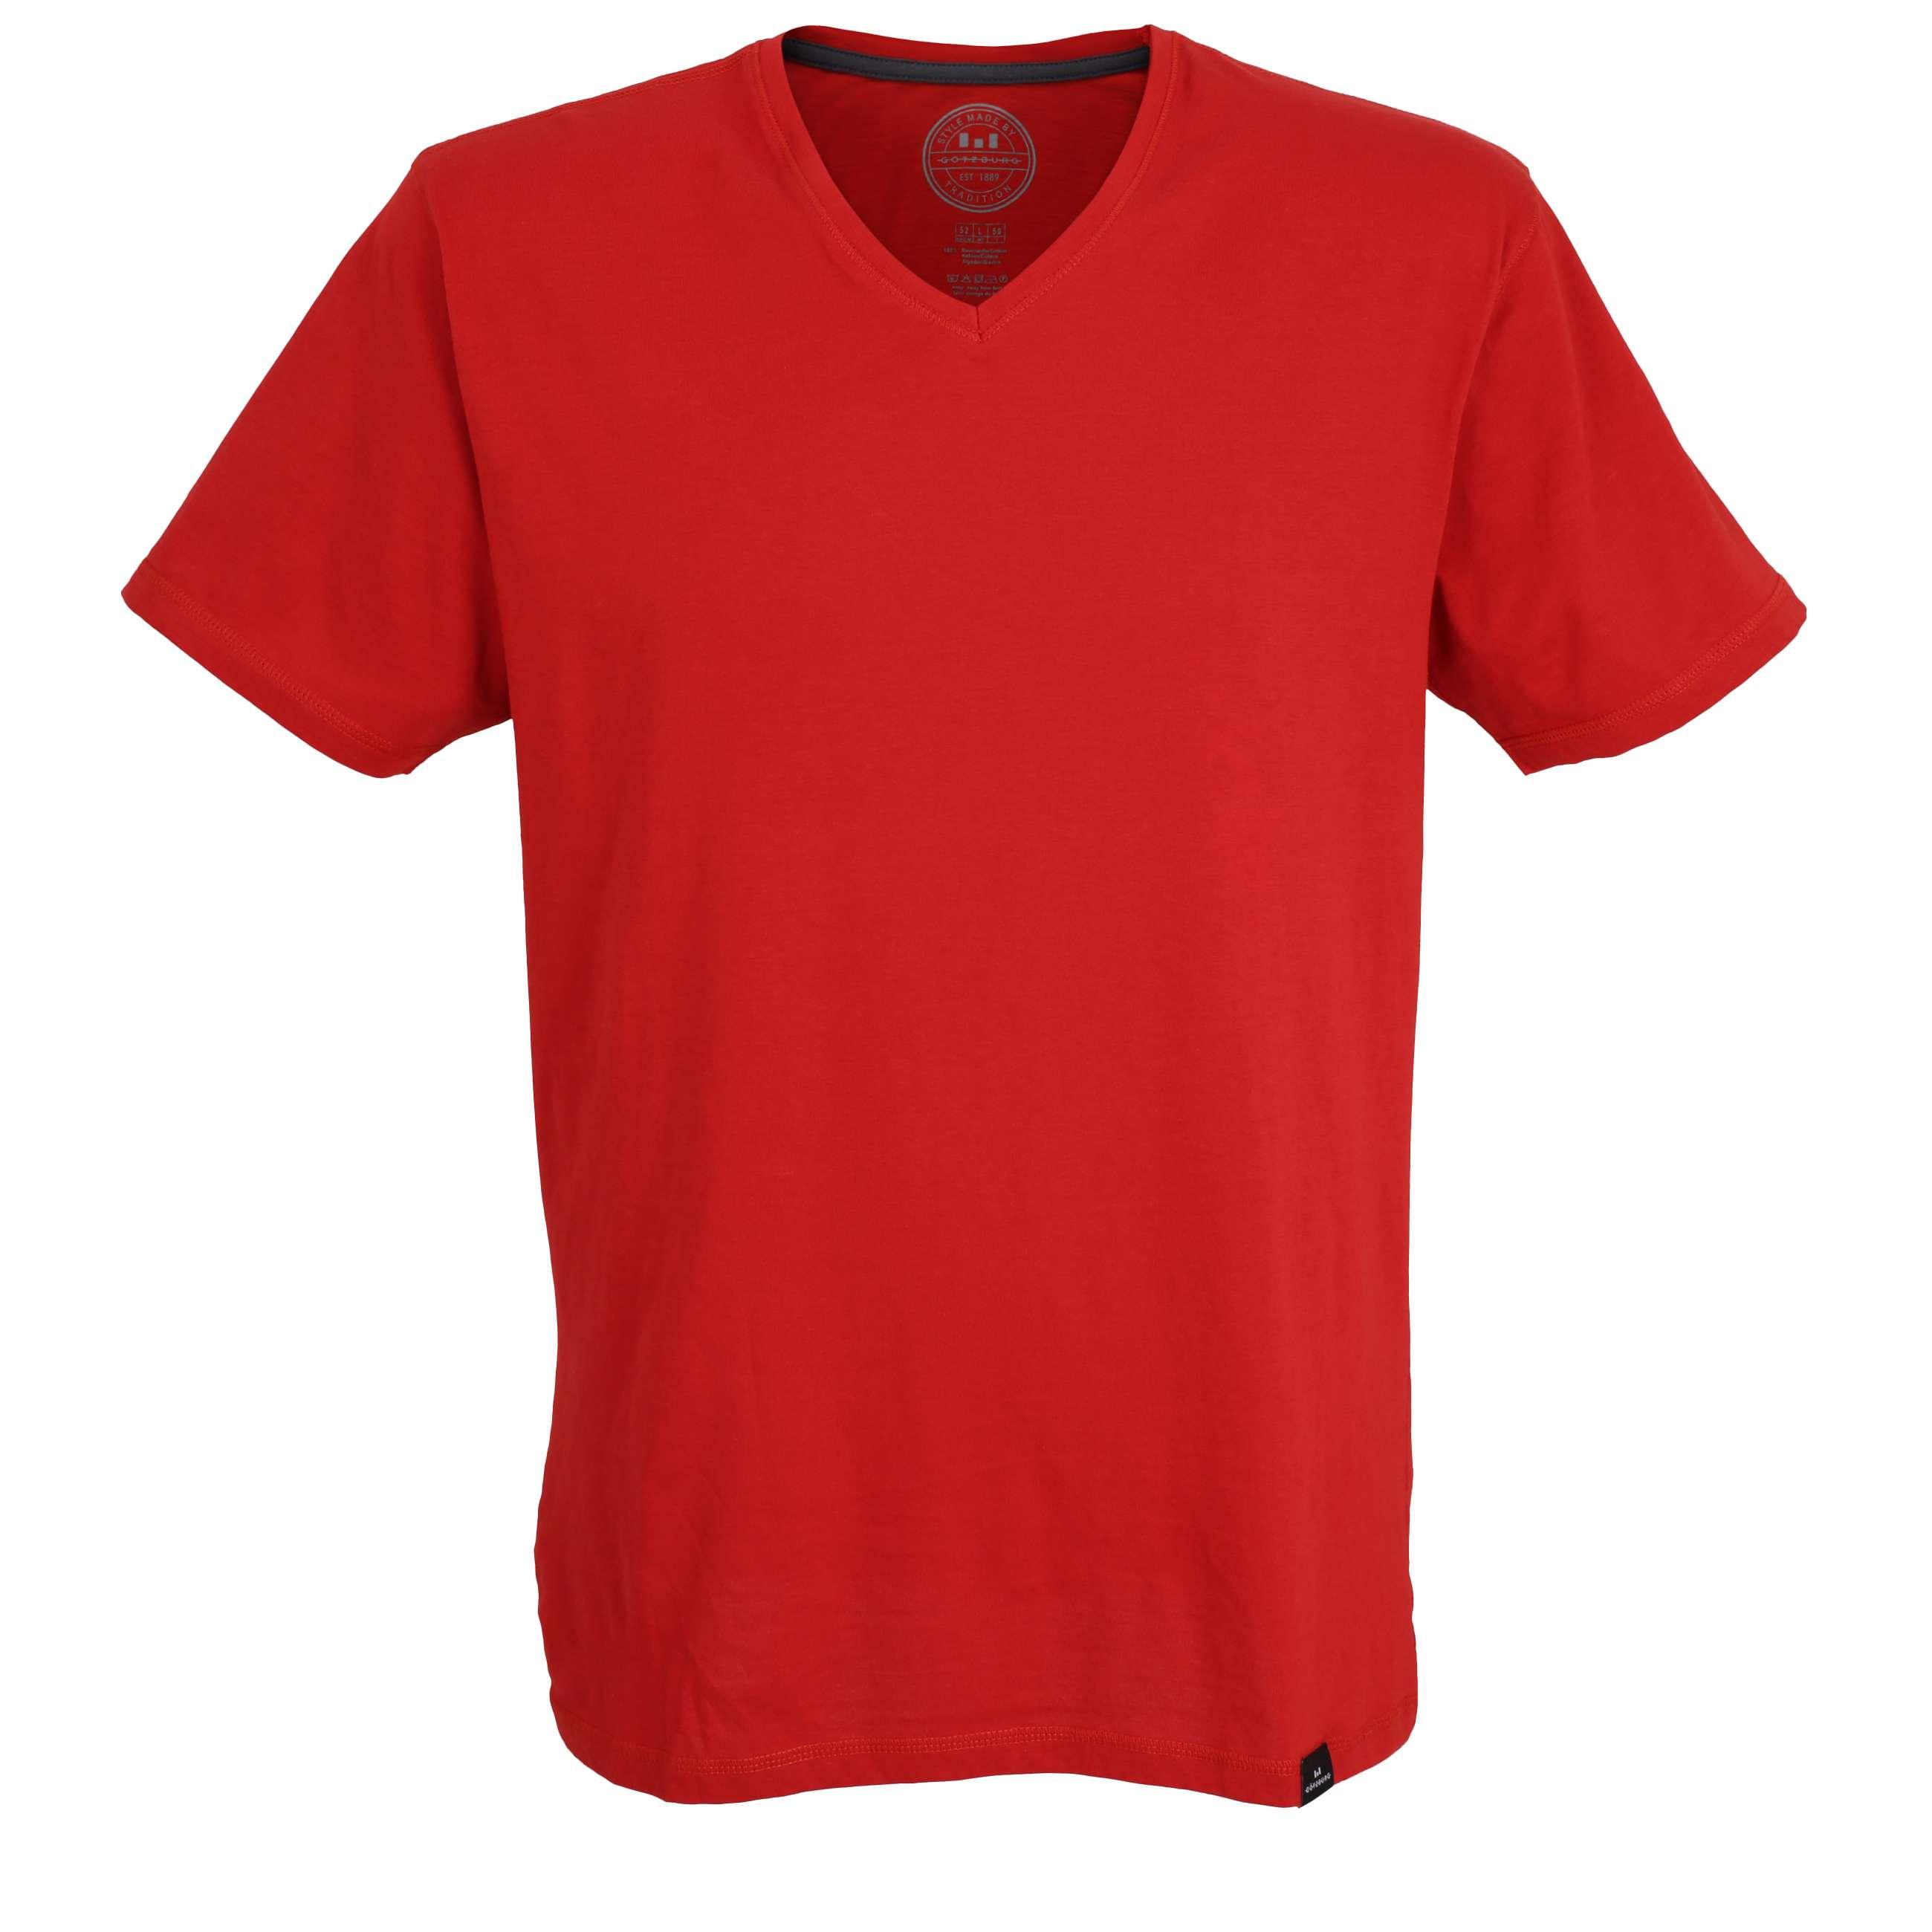 g tzburg herren t shirt shirt american shirt rot uni. Black Bedroom Furniture Sets. Home Design Ideas